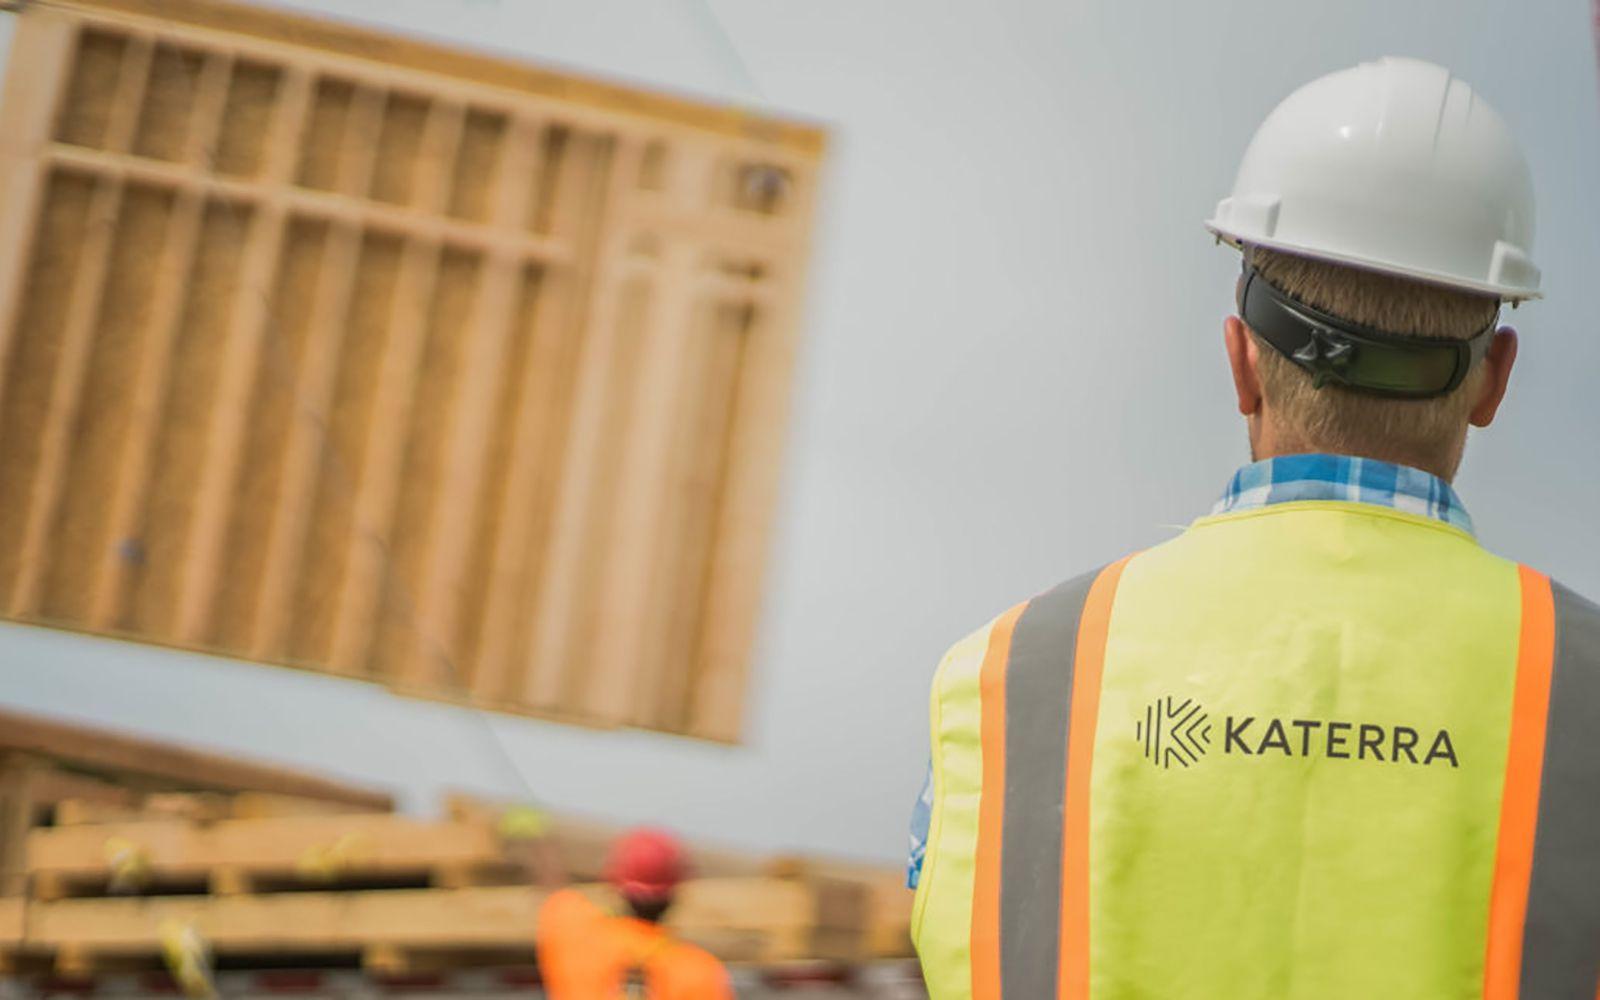 In Katerra's Wake, Builders Blaze Paths To Progress